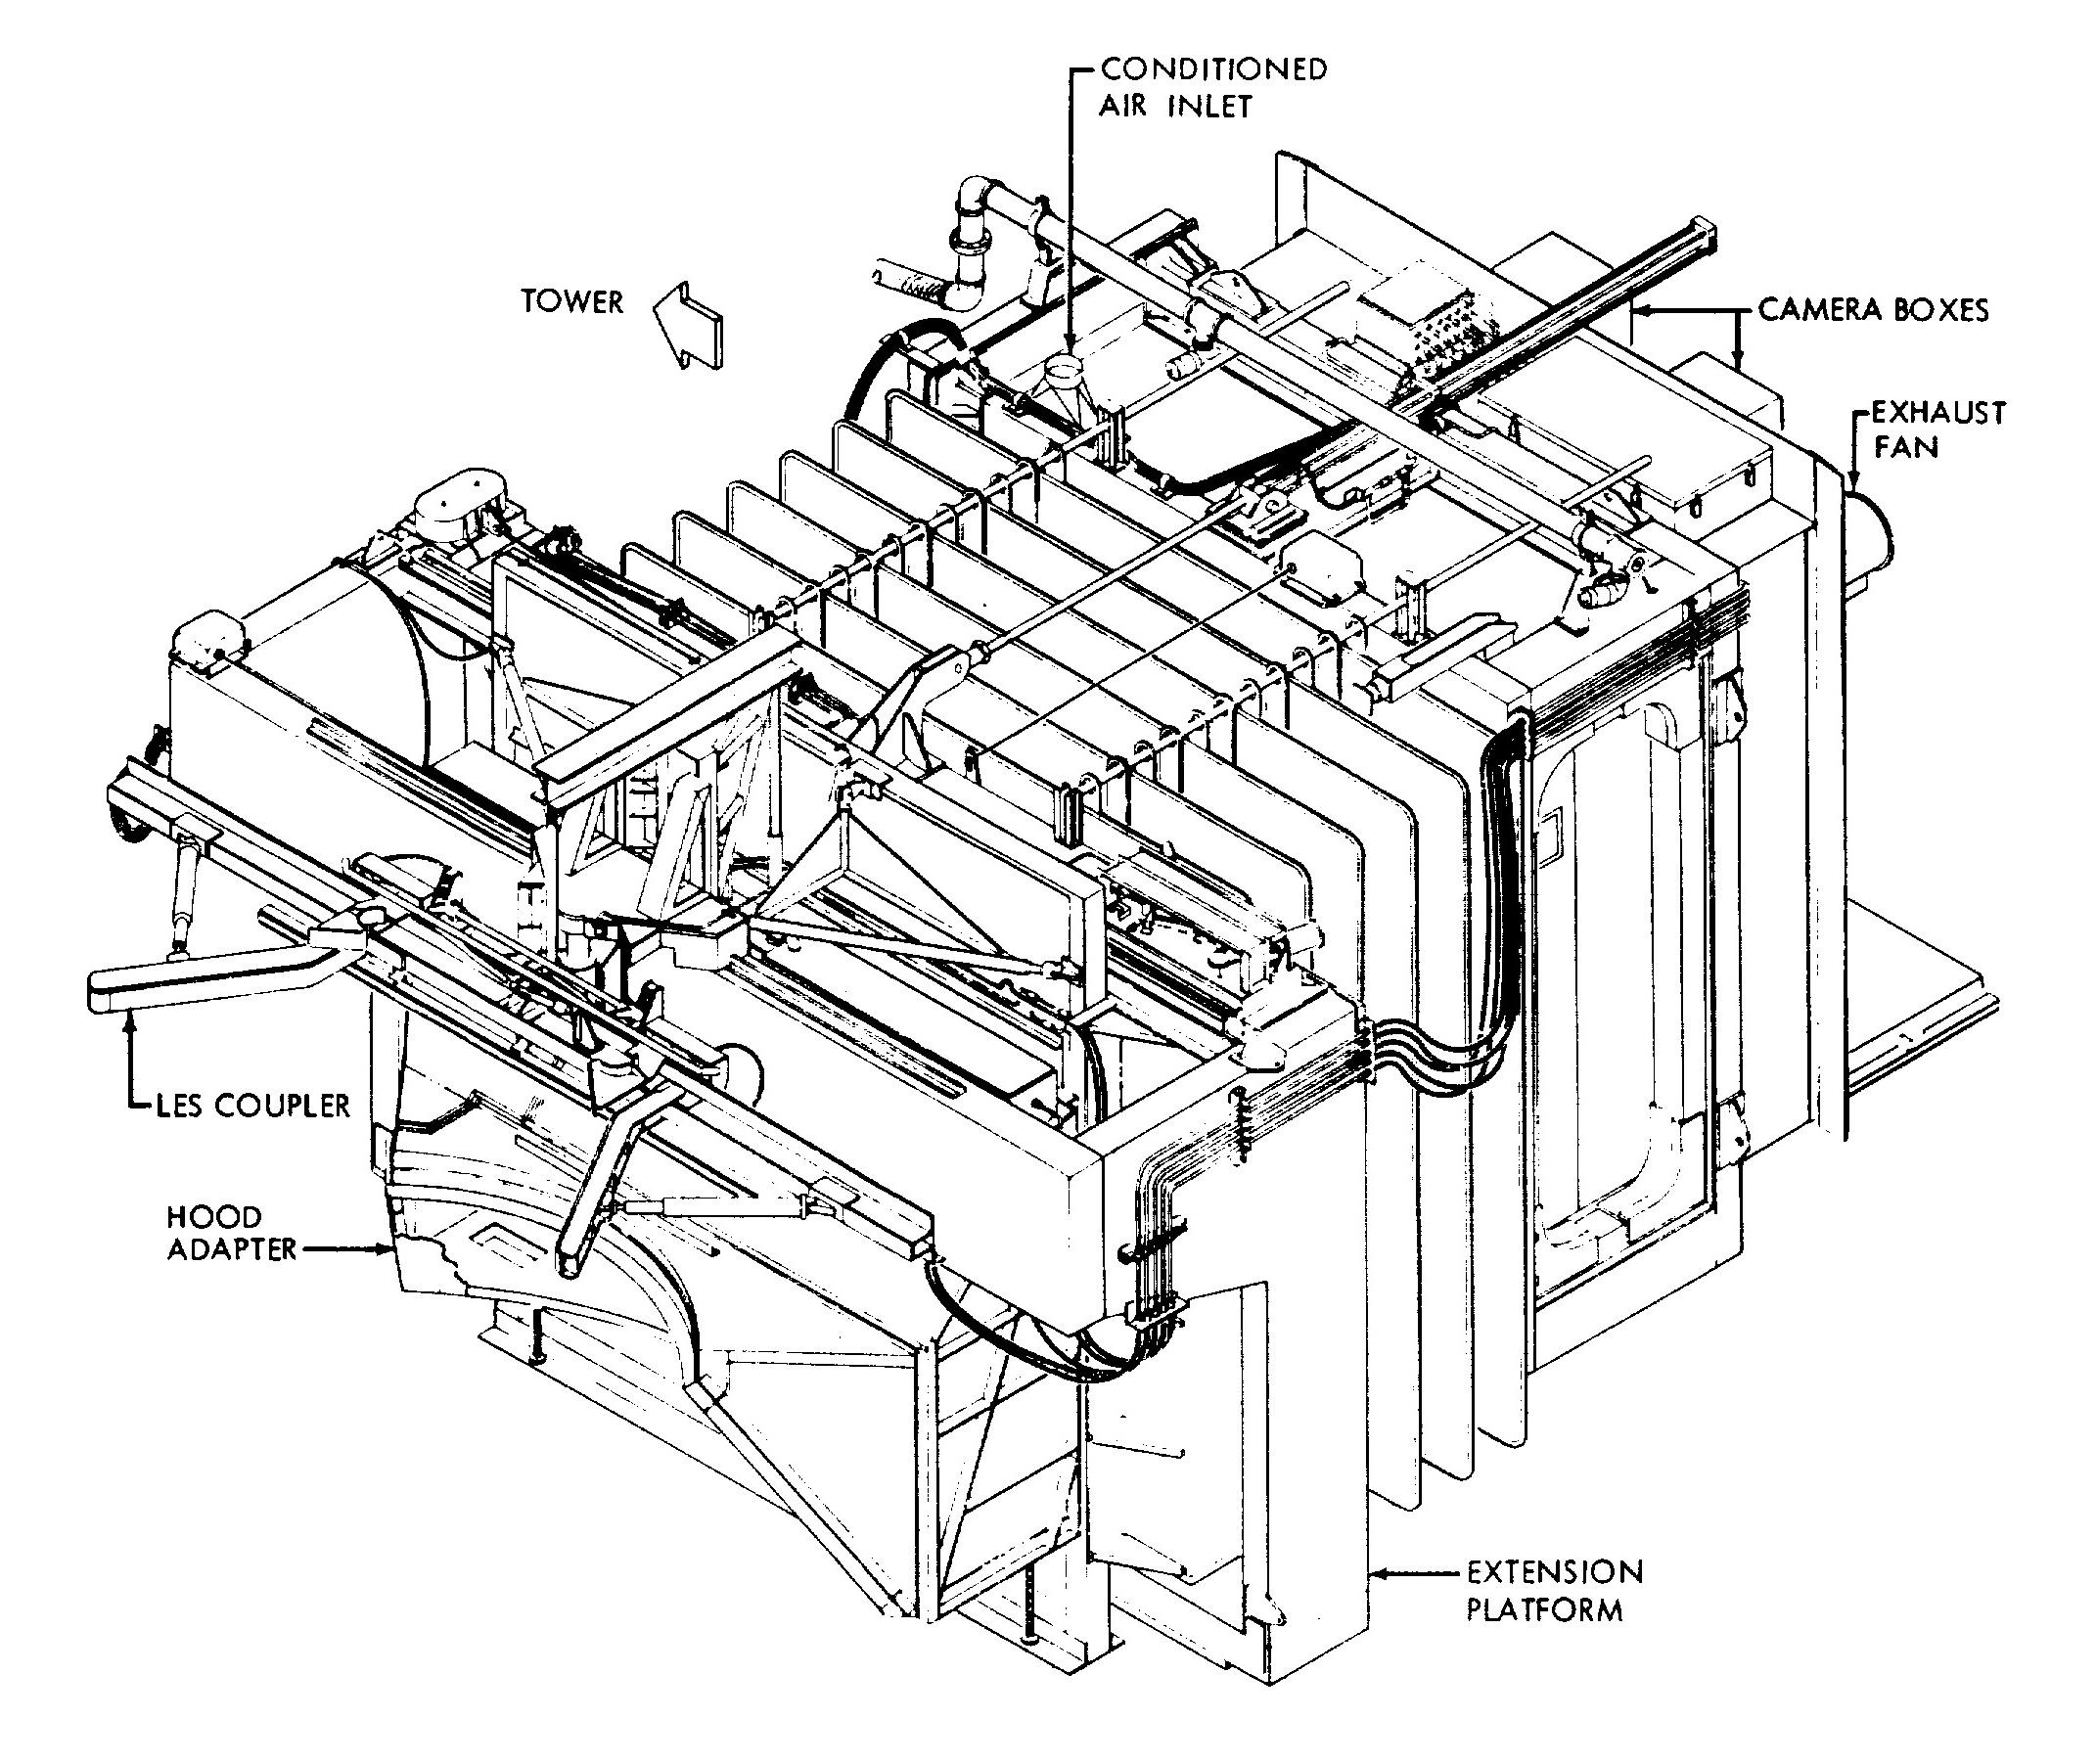 wiring diagram 1988 jaguar xjs v12